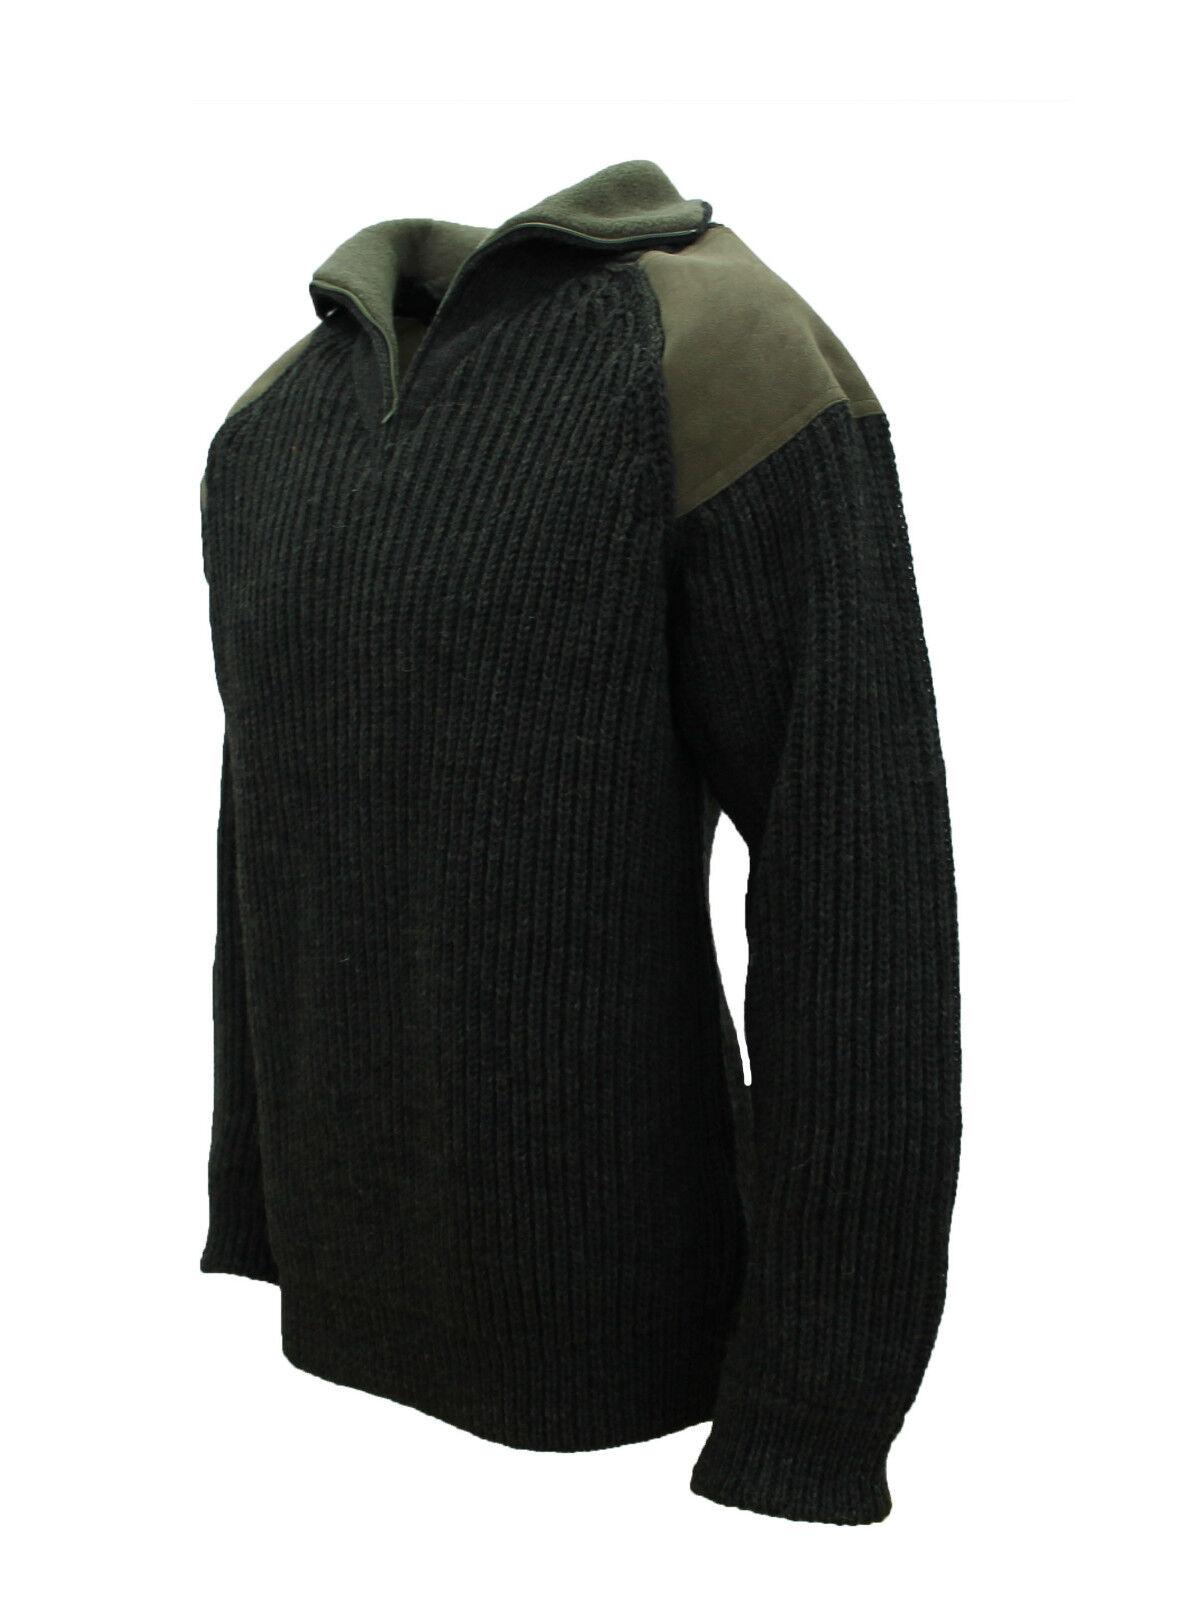 100% British Wool, Zip Collar Country Jumper, fleece collar, Chunky,